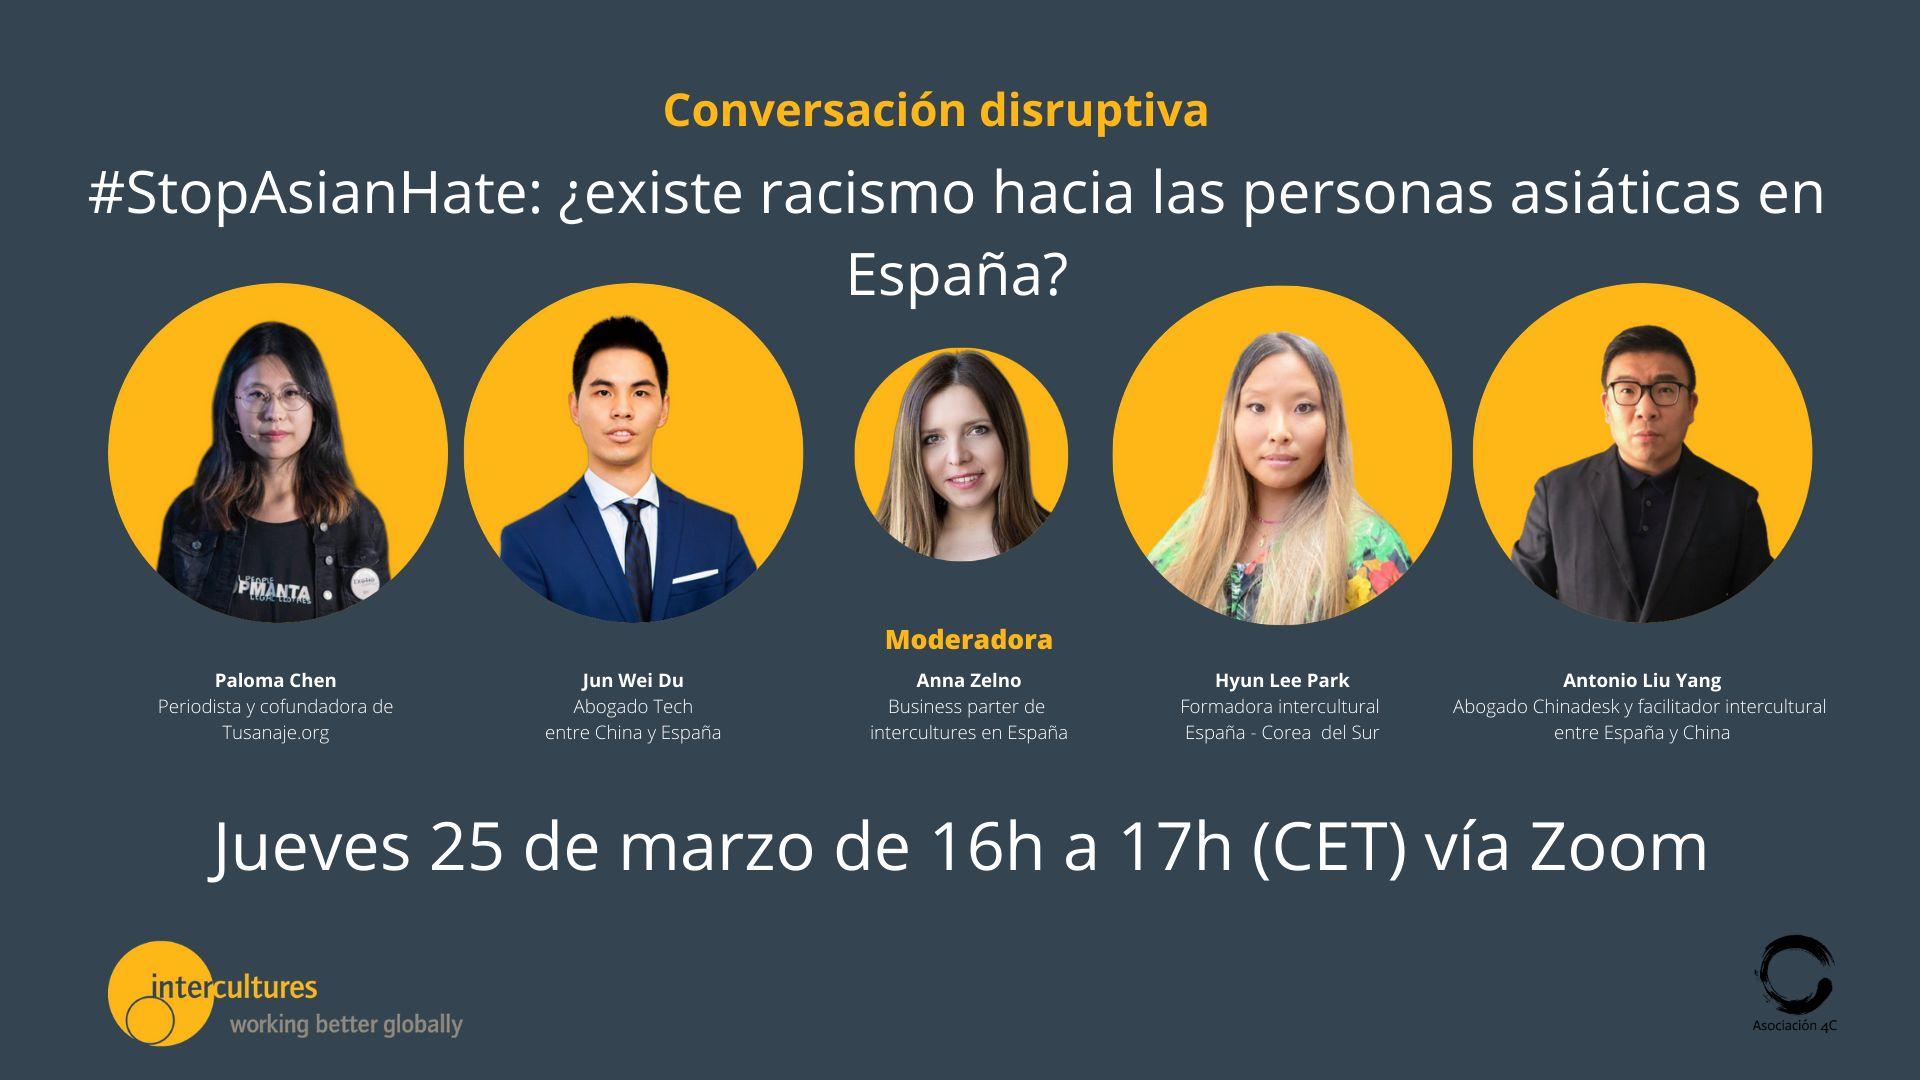 #StopAsianHate: ¿existe racismo hacia las personas asiáticas en España?